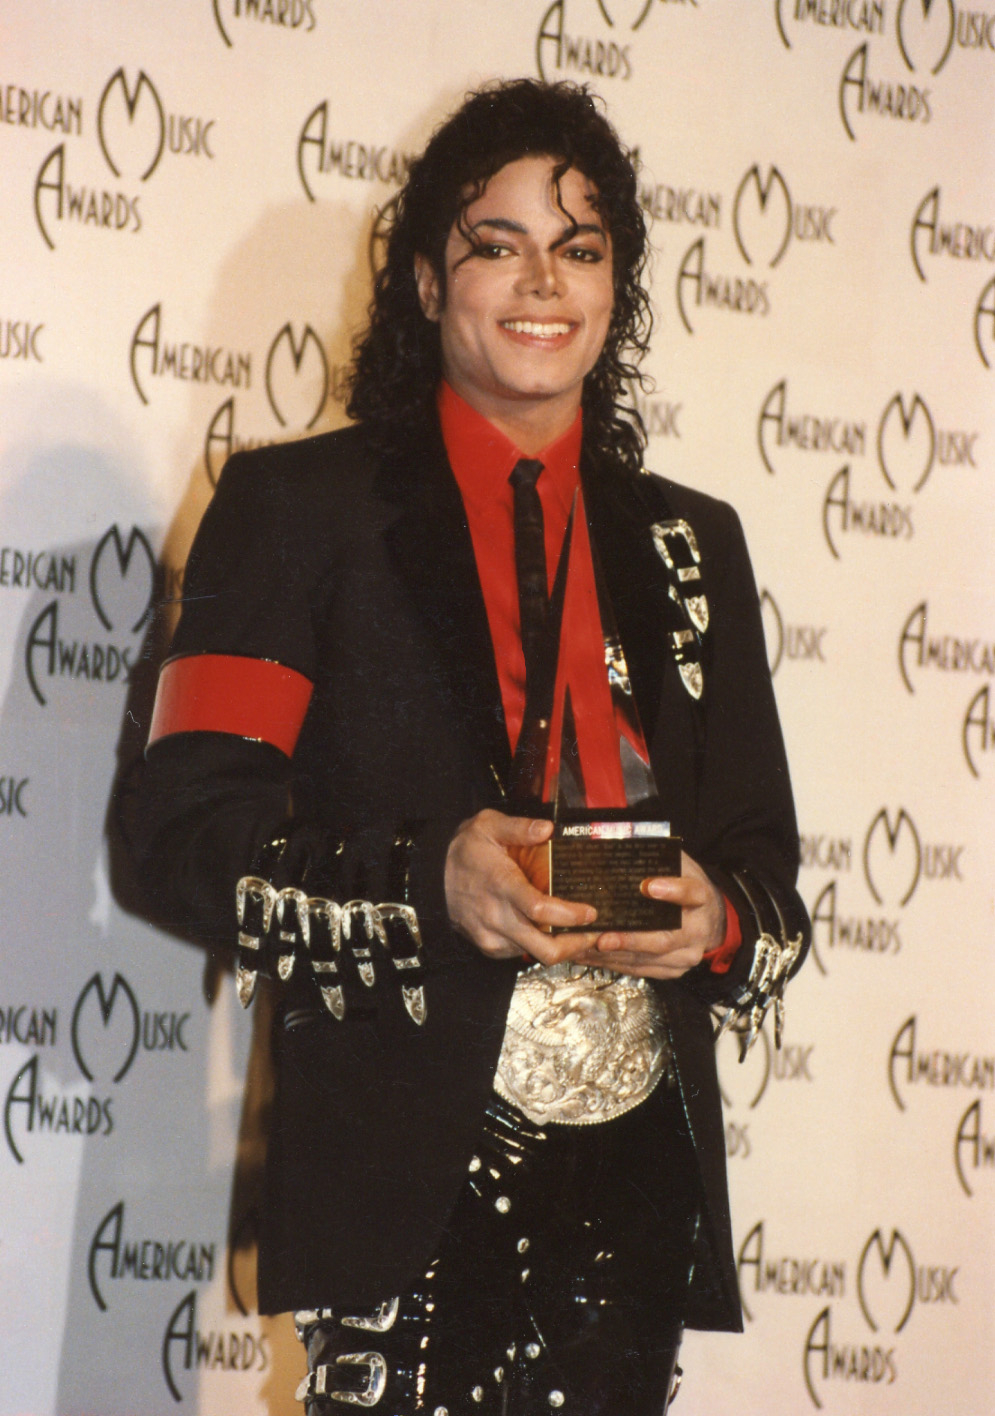 Michael Jackson S Autopsy Revealed Numerous Surgical Scars Black America Web